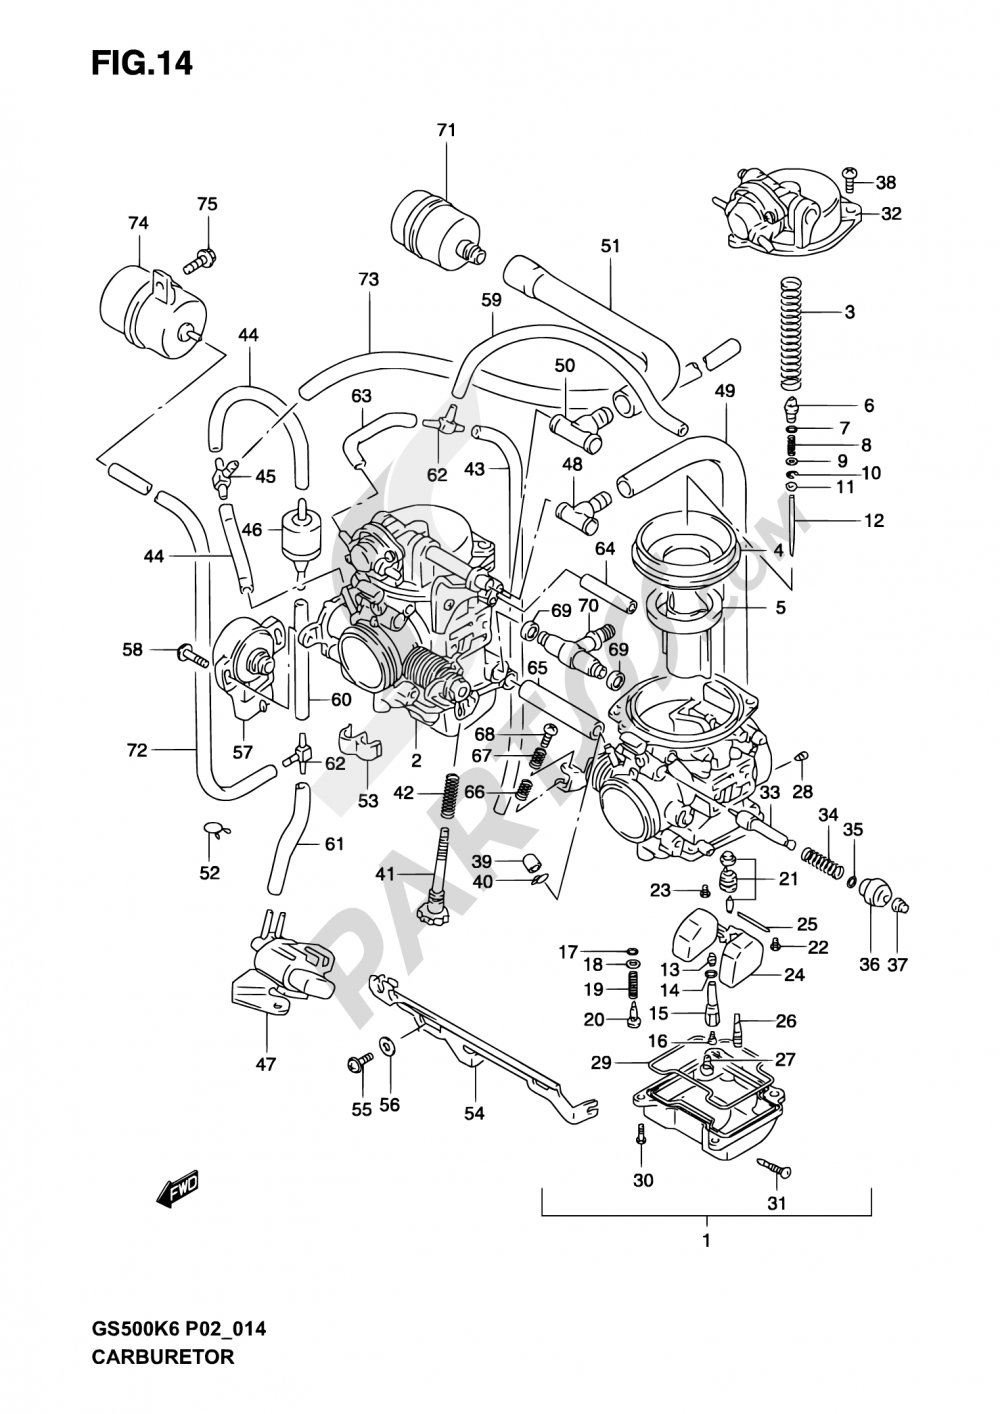 14 - CARBURETOR (GS500HK3/HUK3) Suzuki GS500F 2006